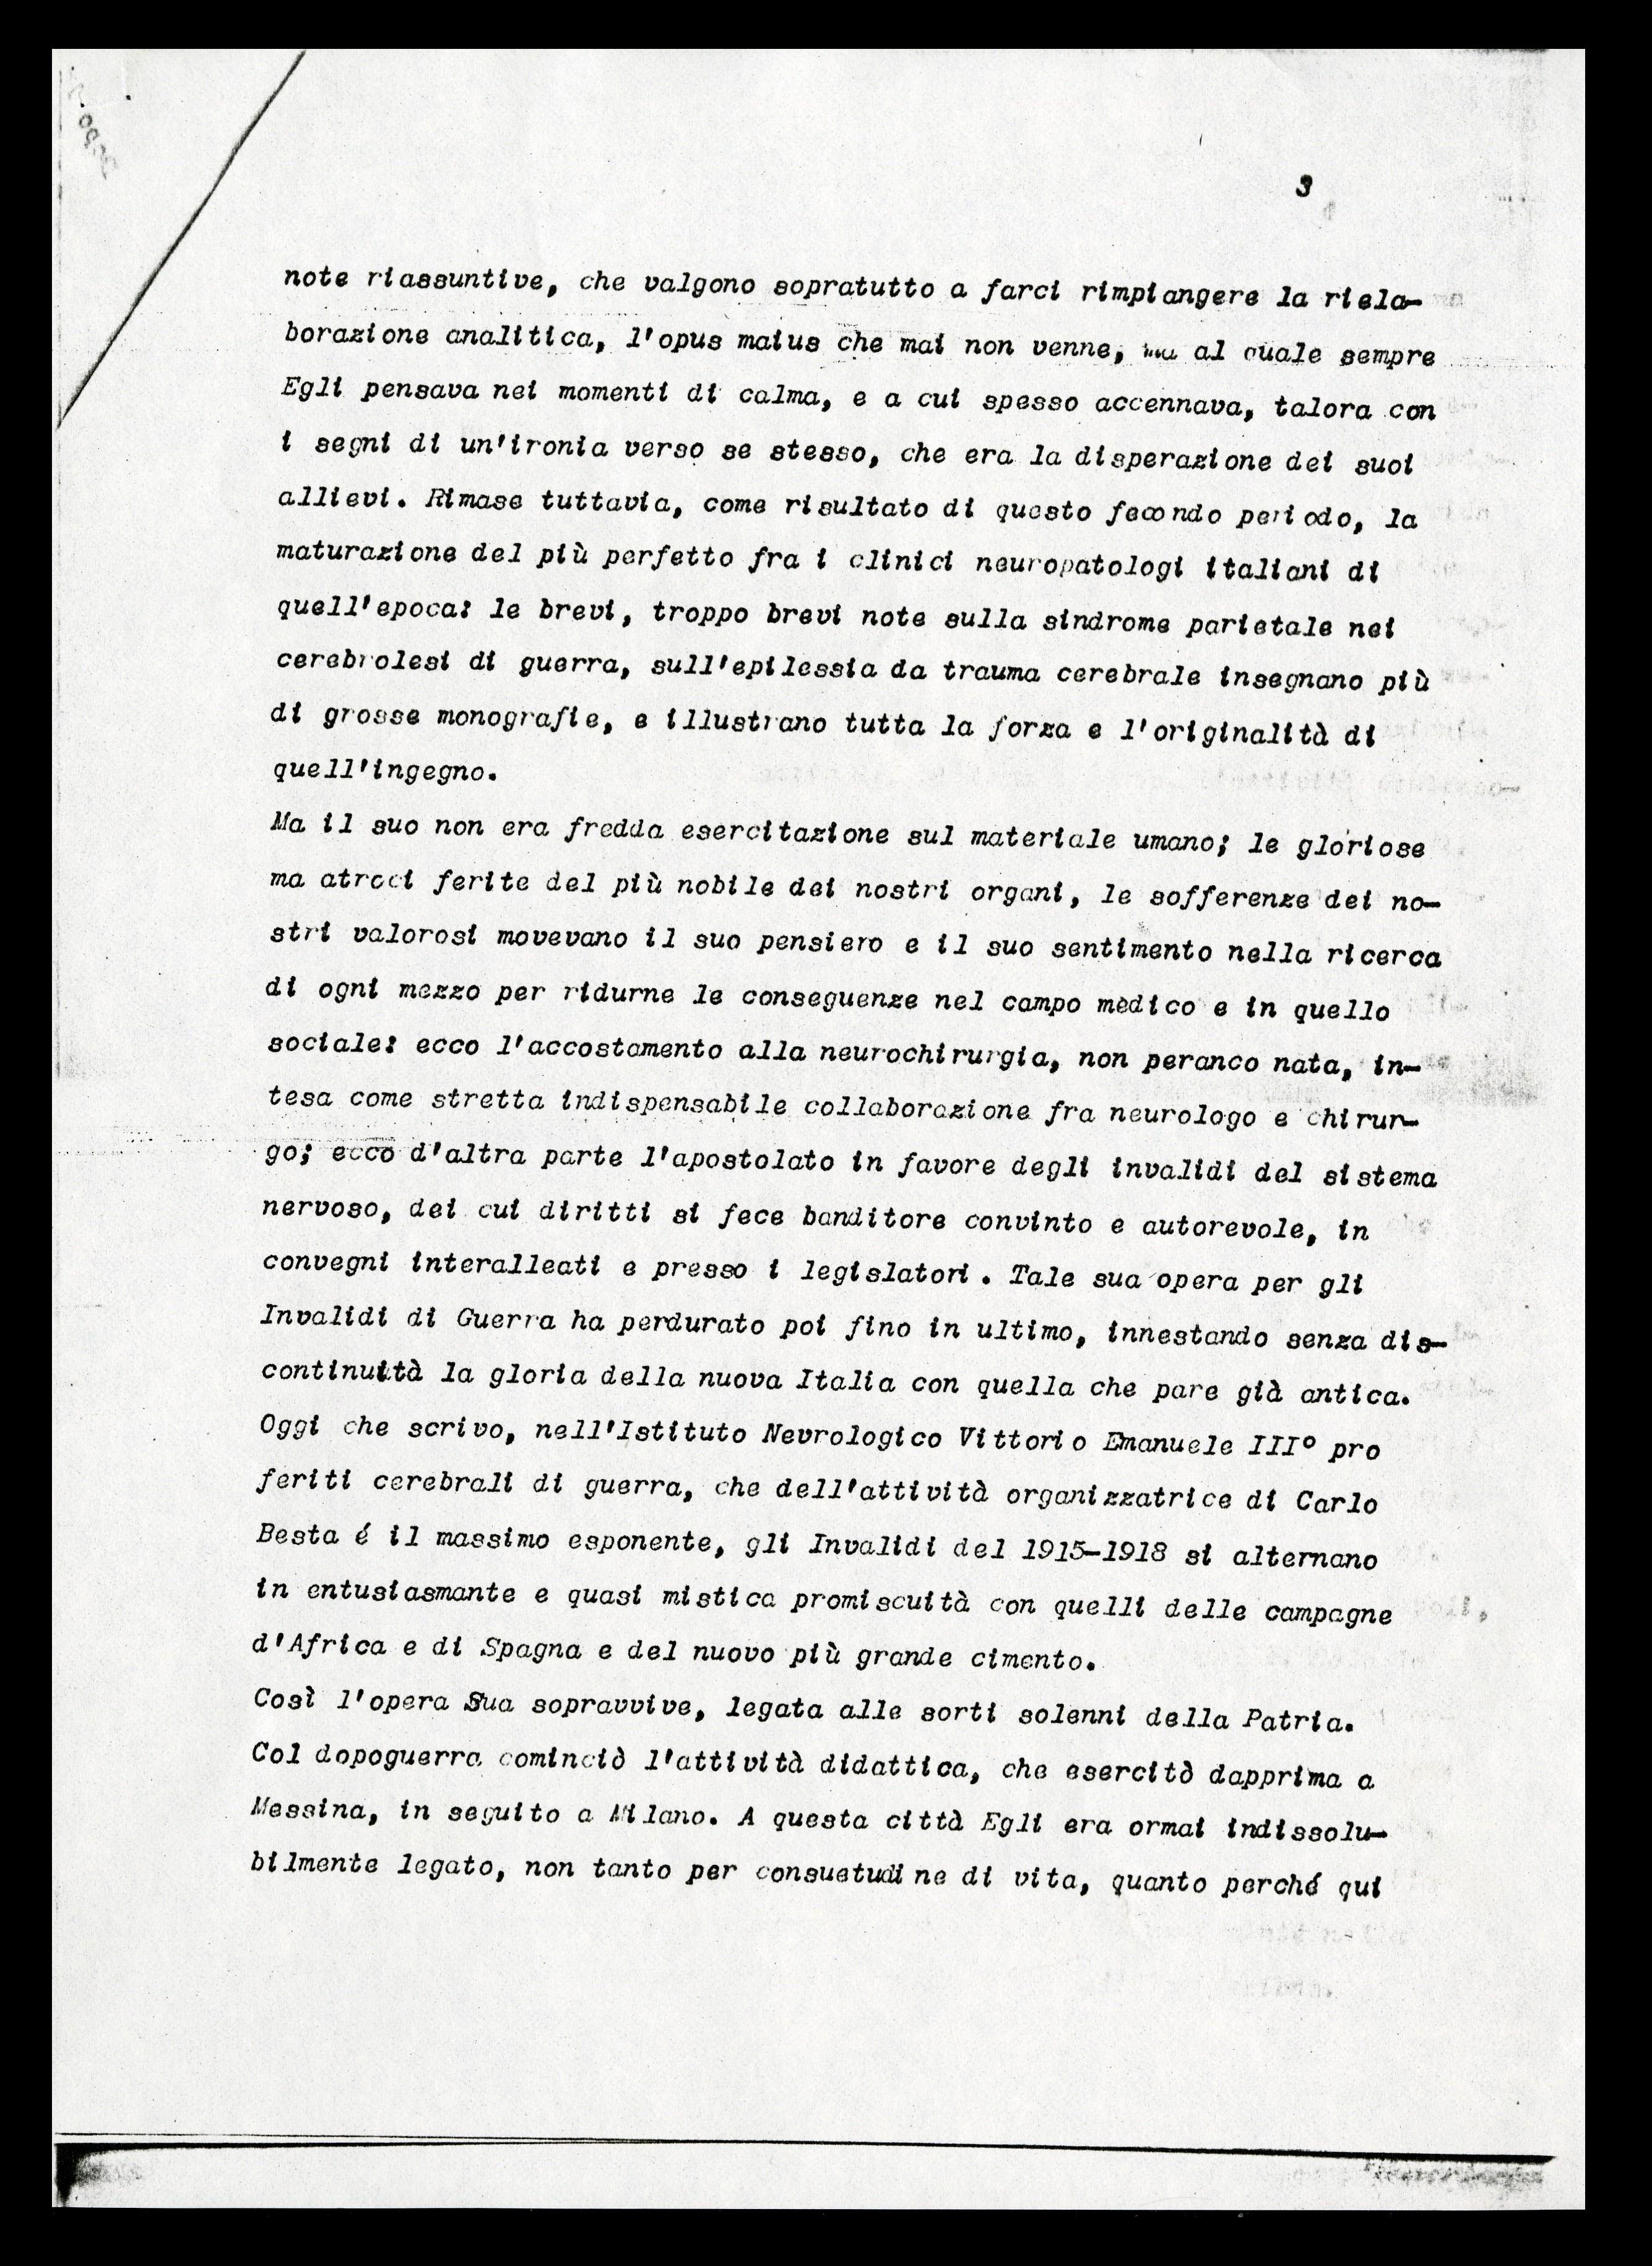 Curriculum Di Besta Per Il Cinquantenario Dell Istituto Aspi